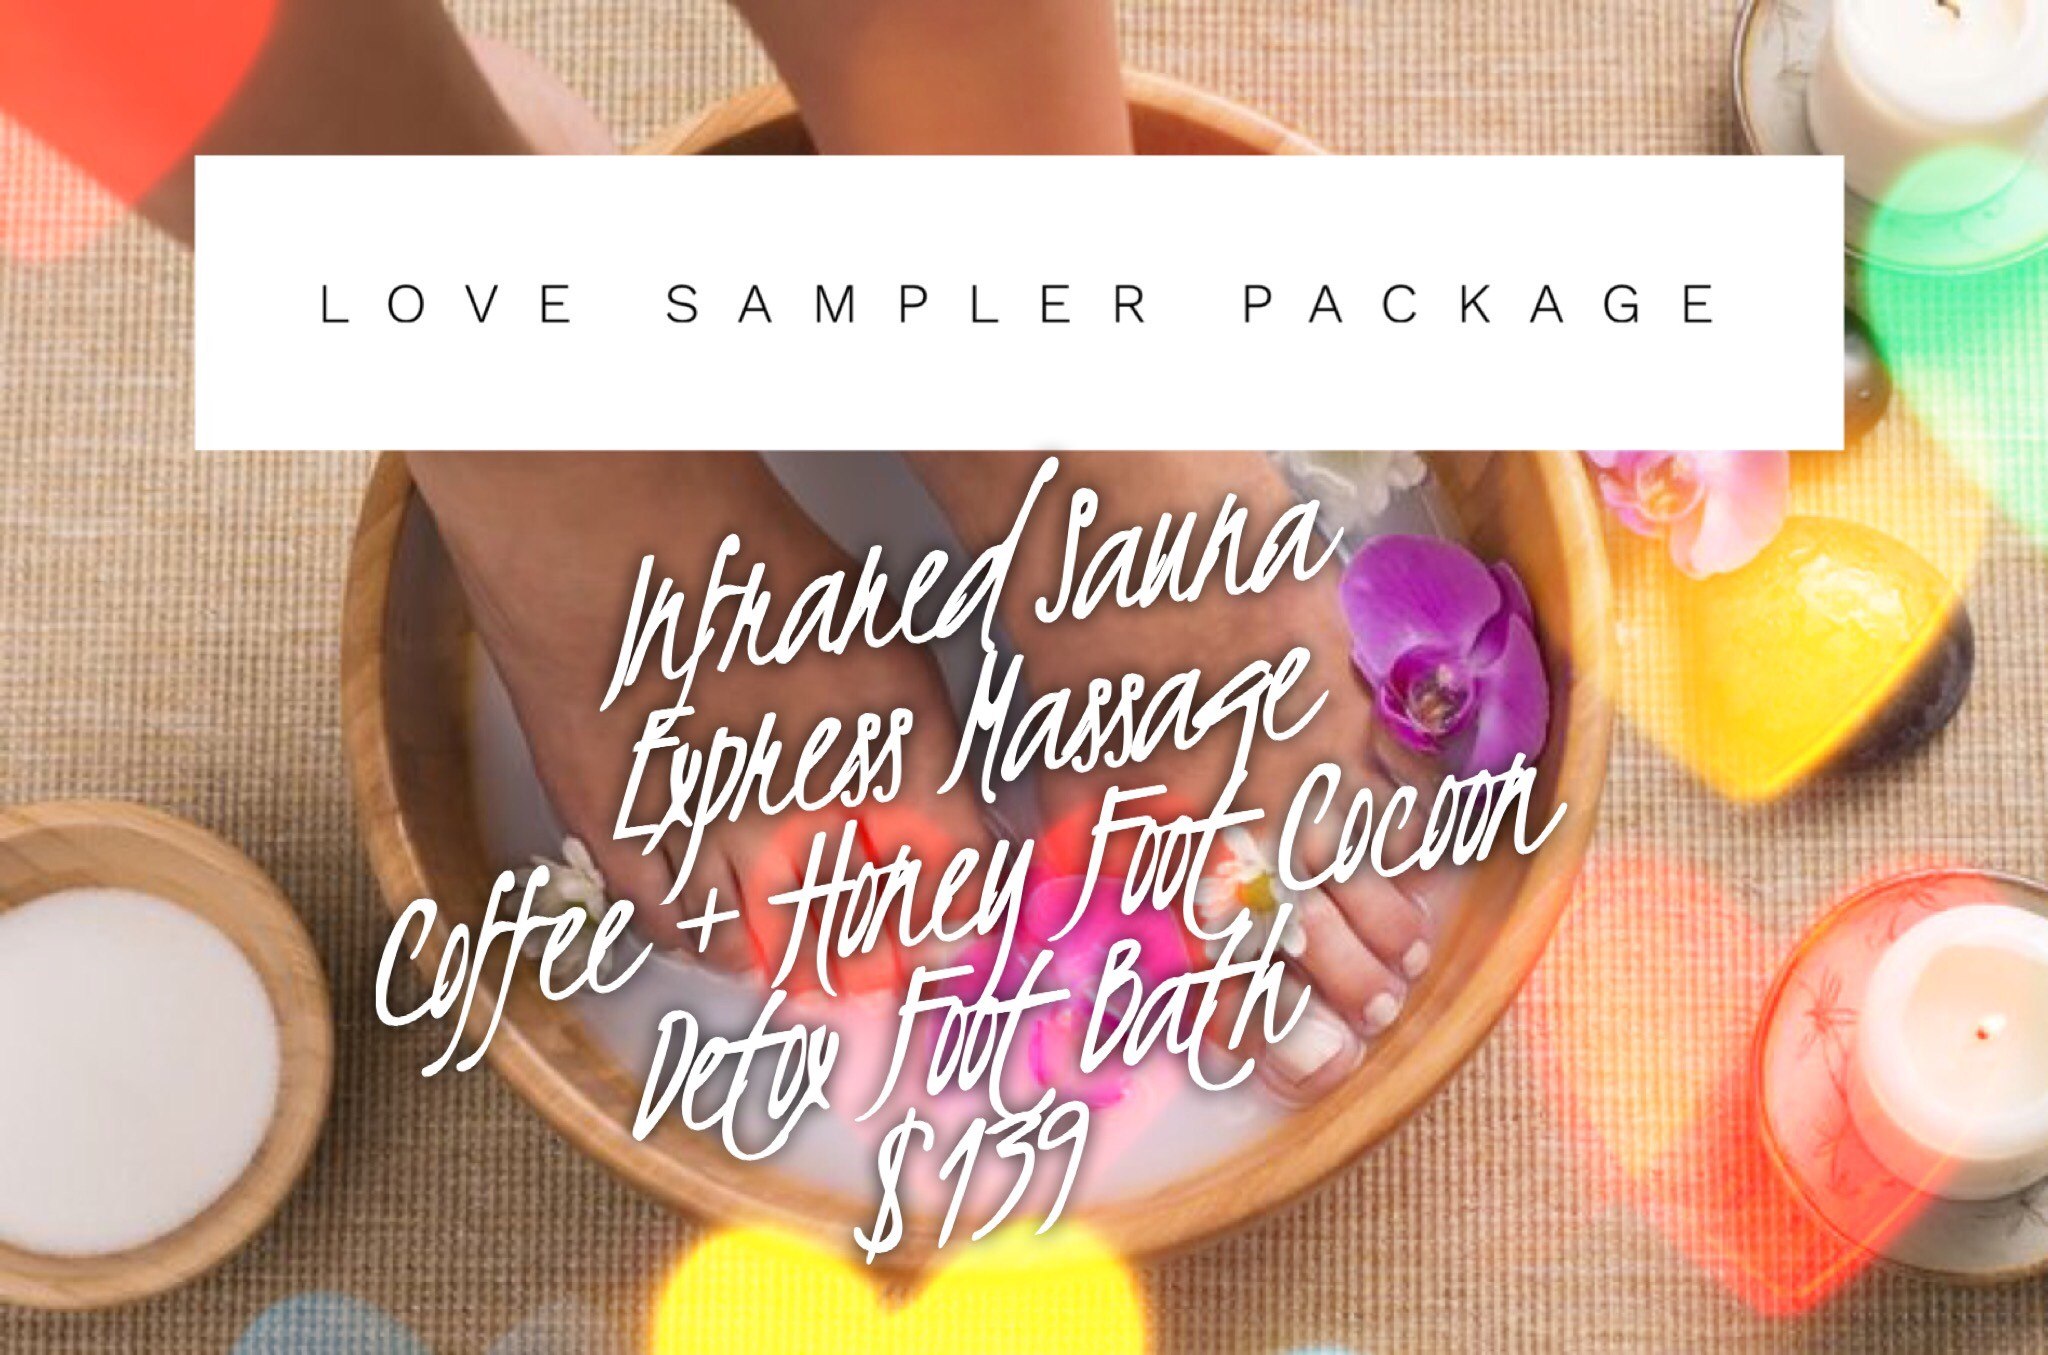 Valentines spa package